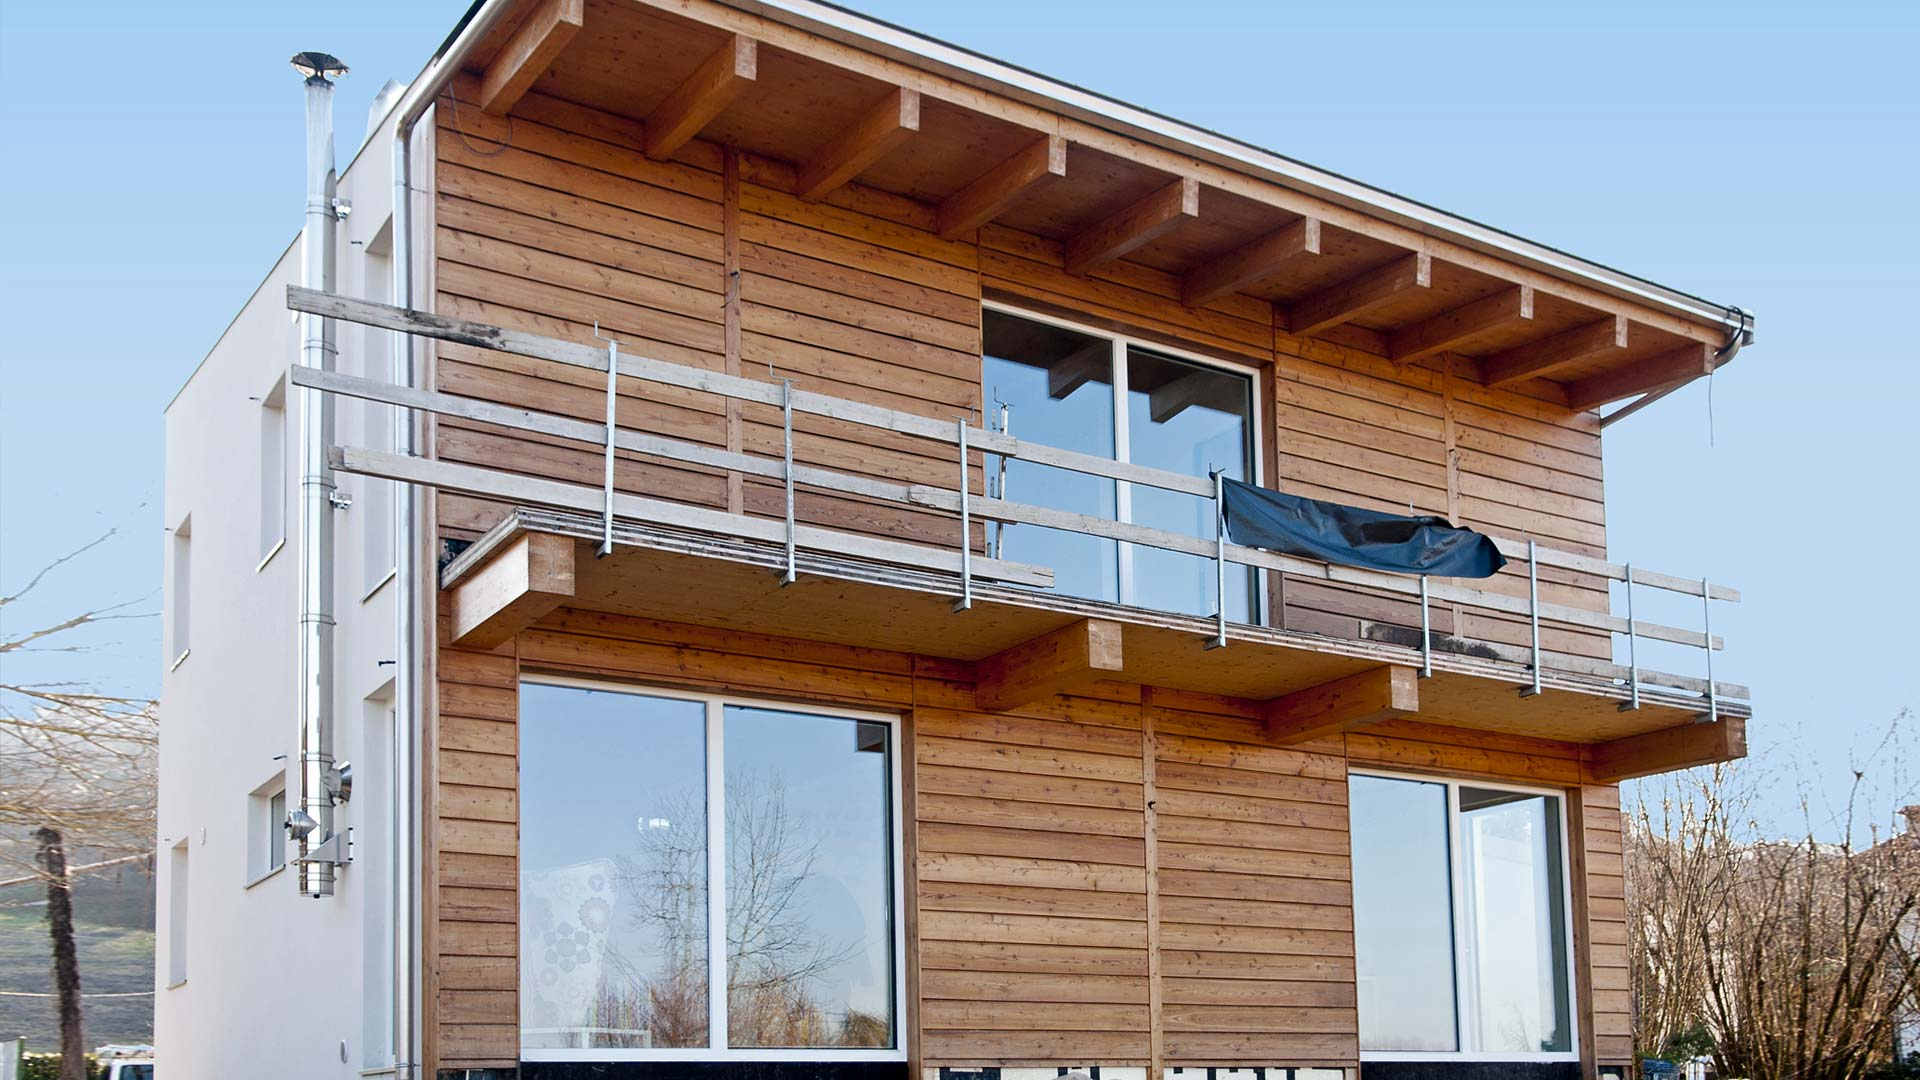 Casa indipendente in legno bbs a due piani a cherasco for Casa a due piani